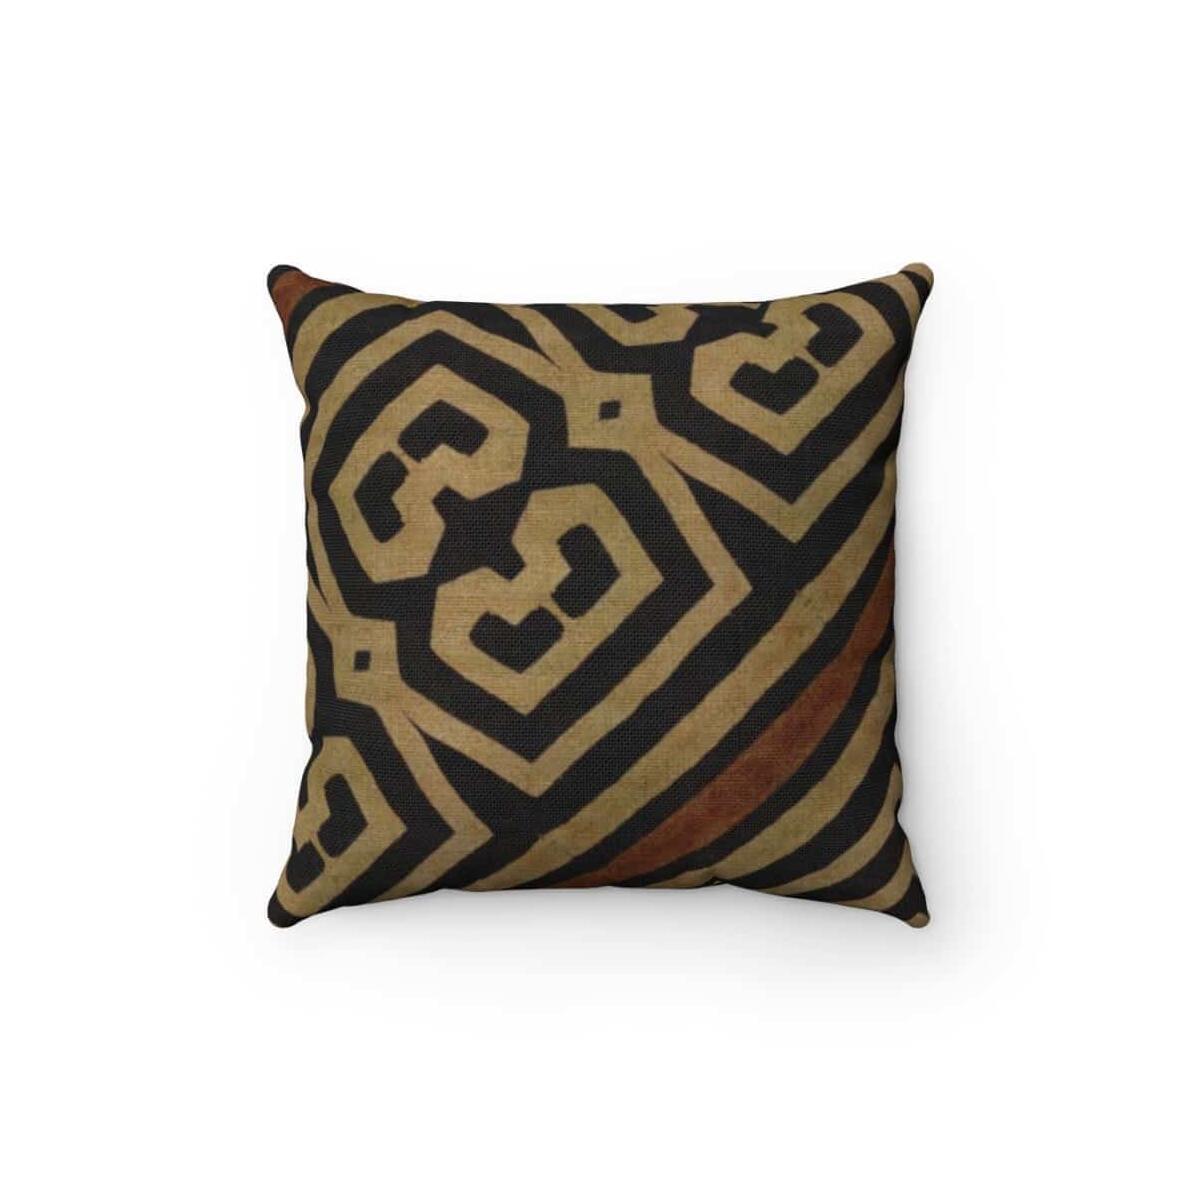 Bogolanfini Spun Polyester Square Pillow, 20